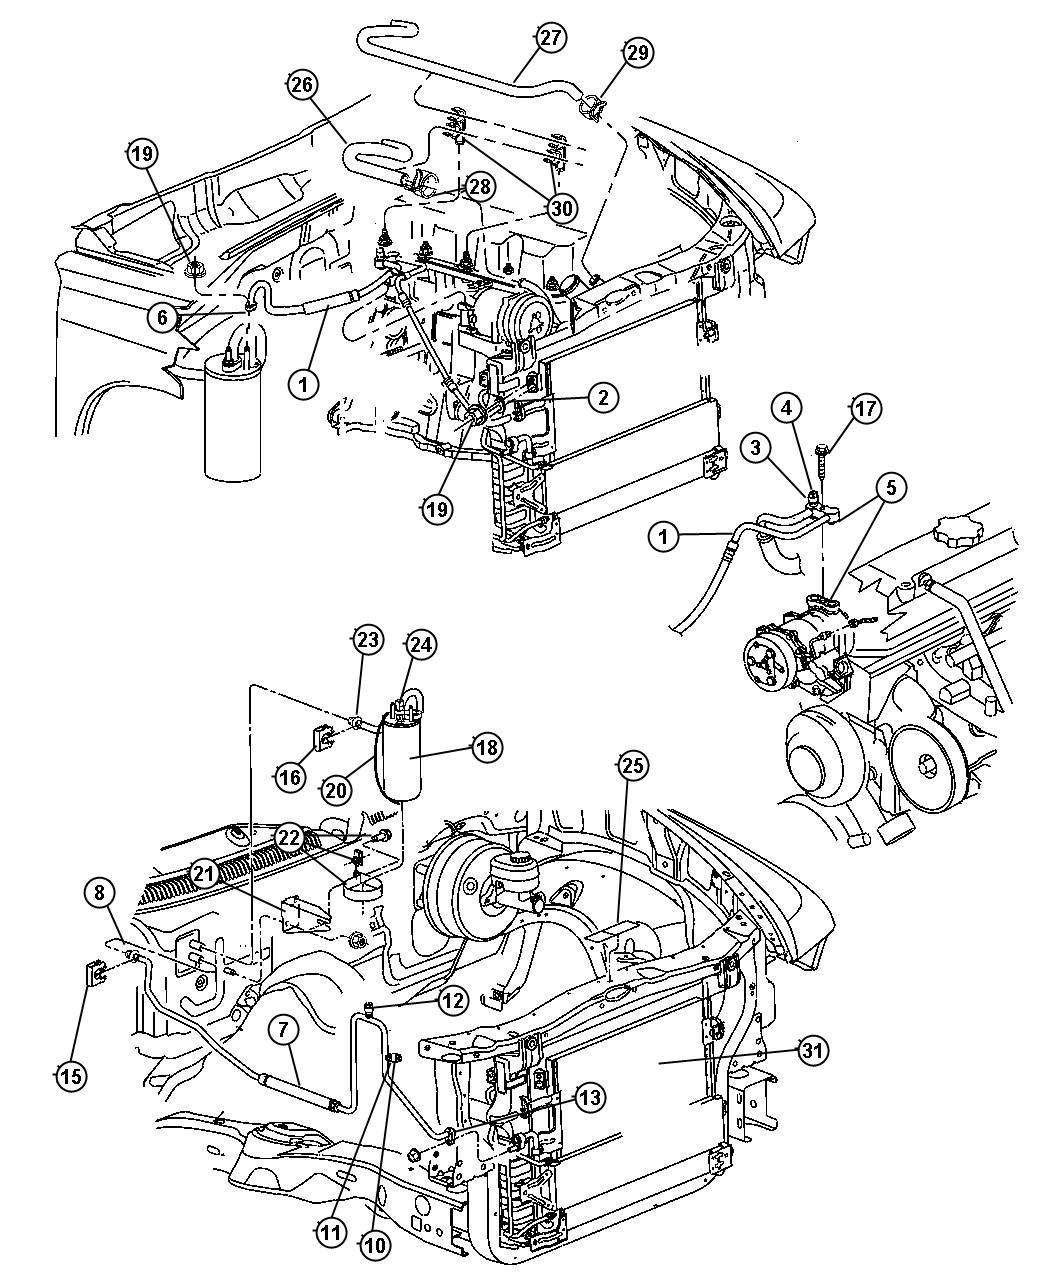 Dodge Dakota Valve, valve core. A/c line, charging